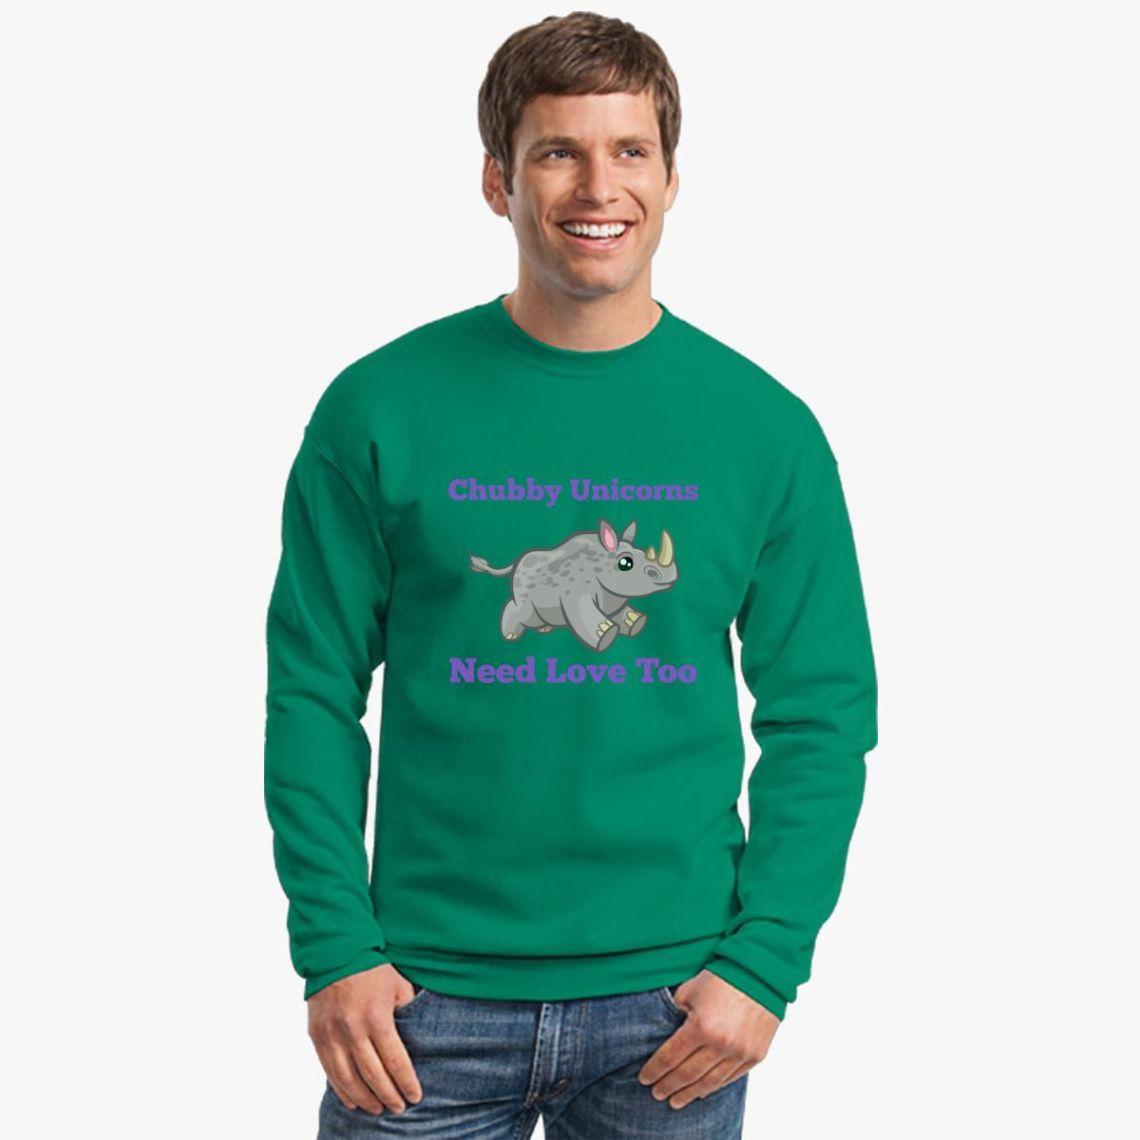 Download Chubby Unicorns Need Love Too Crewneck Sweatshirt - Customon